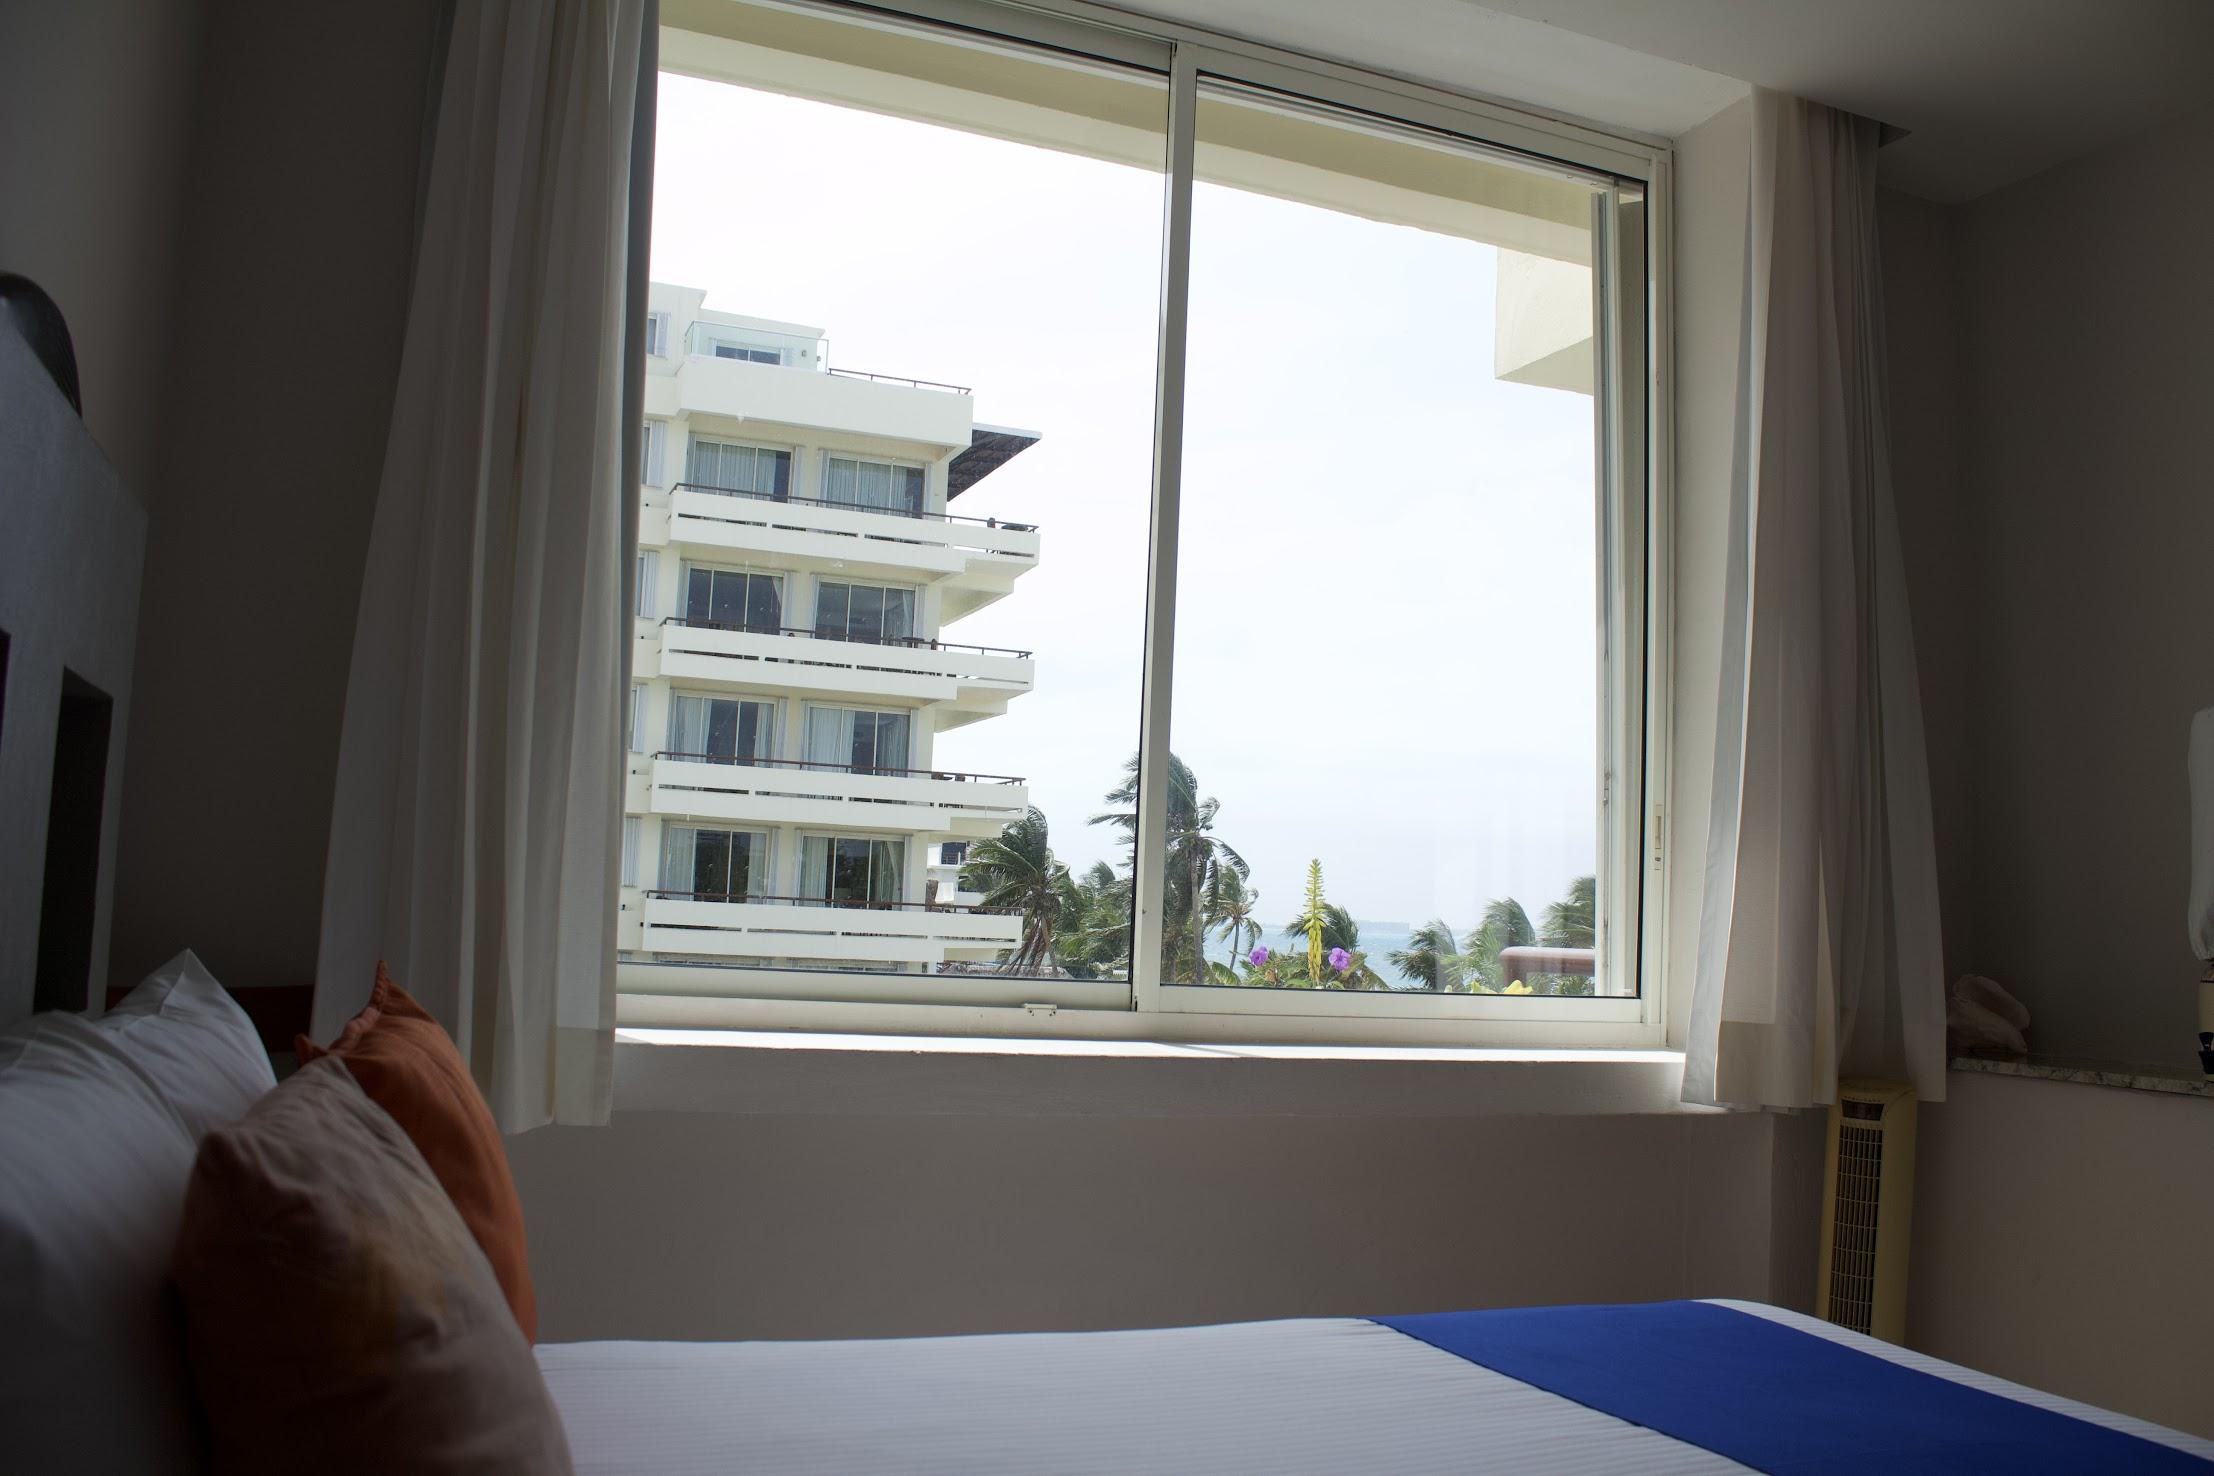 310 guest room view.jpg